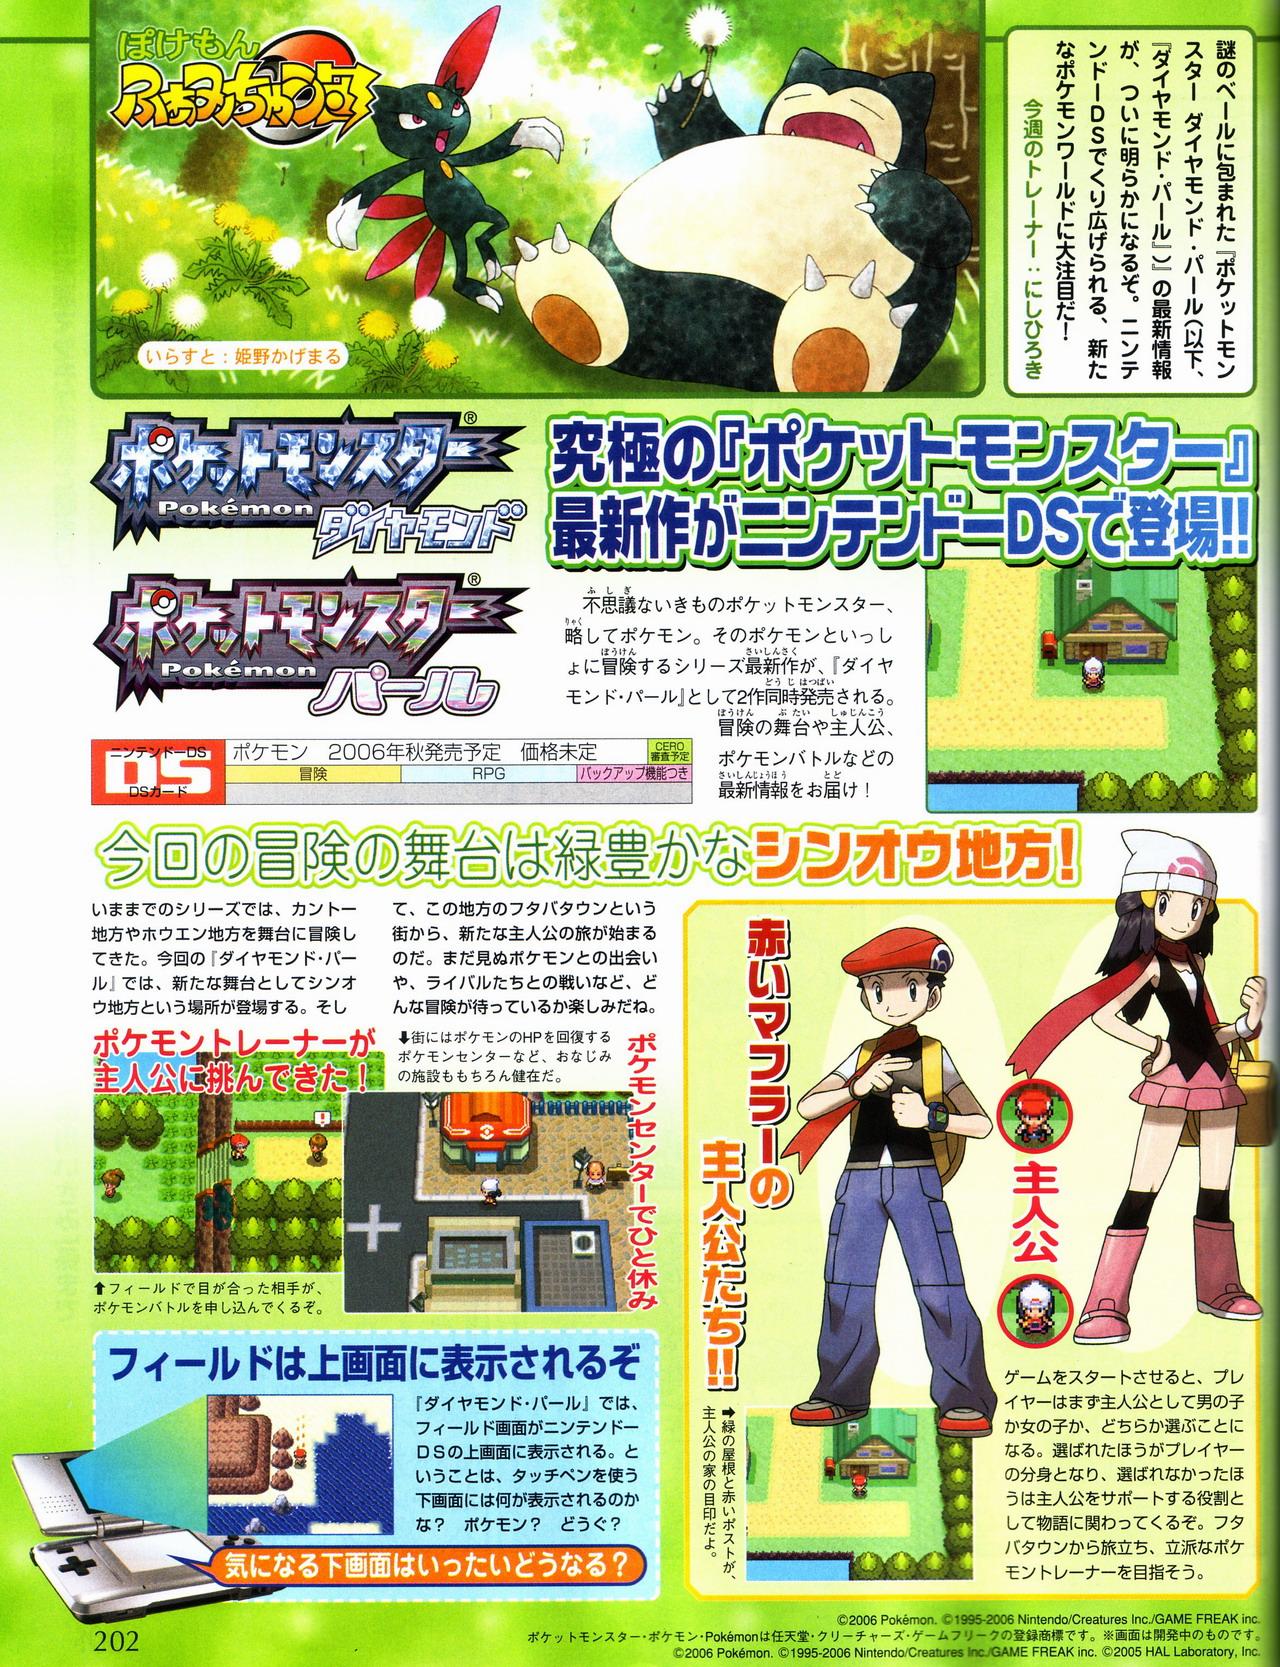 34650_Pokemon_D_P_F911ar.jpg